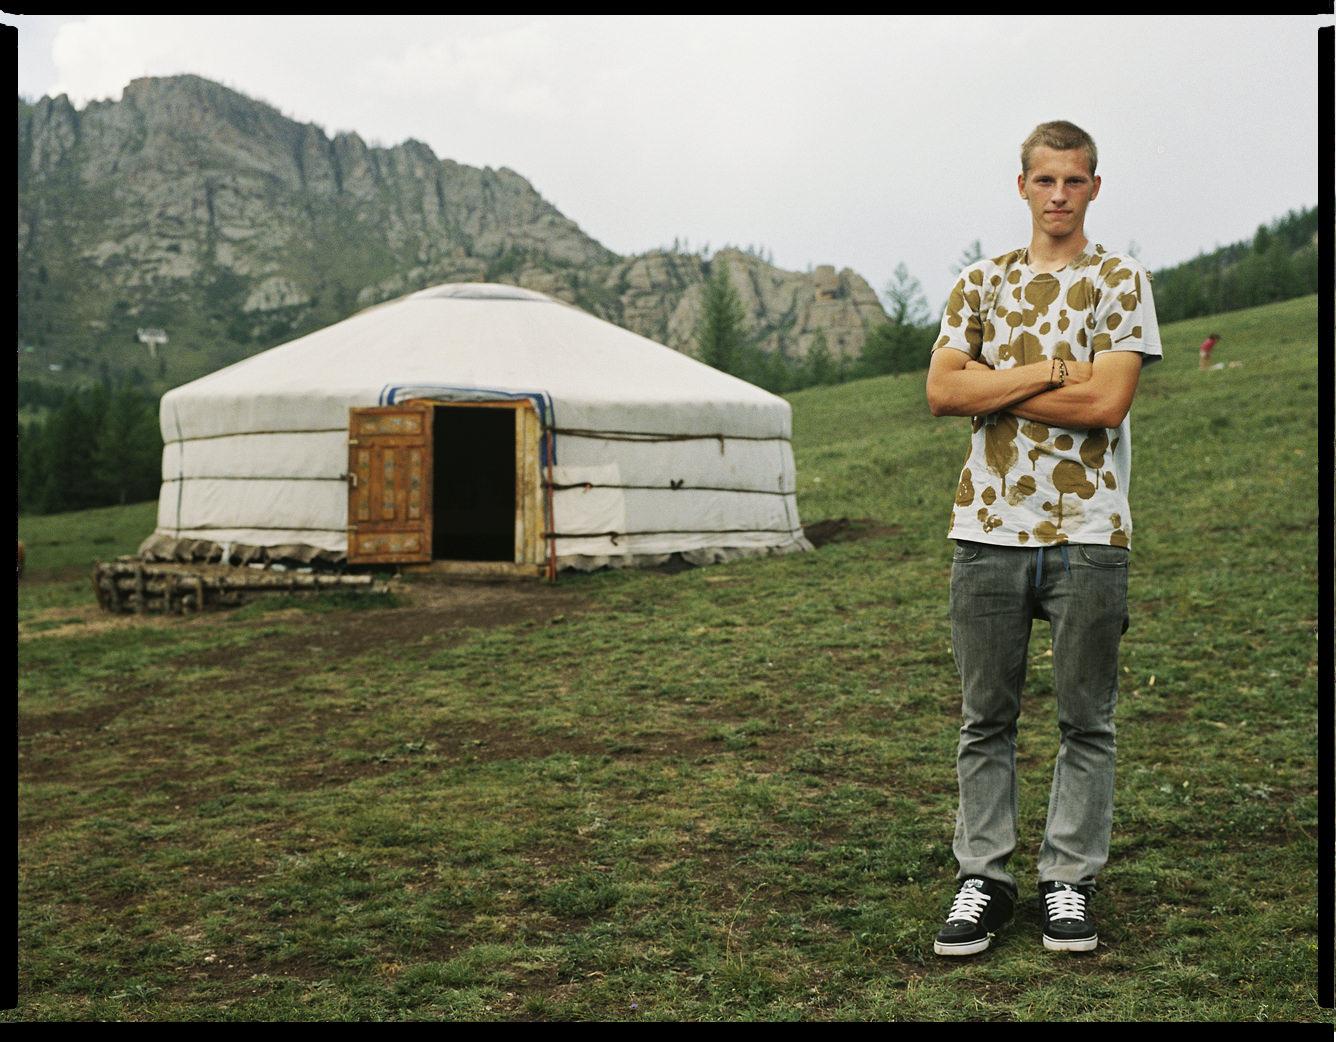 MediumFormatPatrikWallner_Mongolia_GerWithStasLOWQ-1